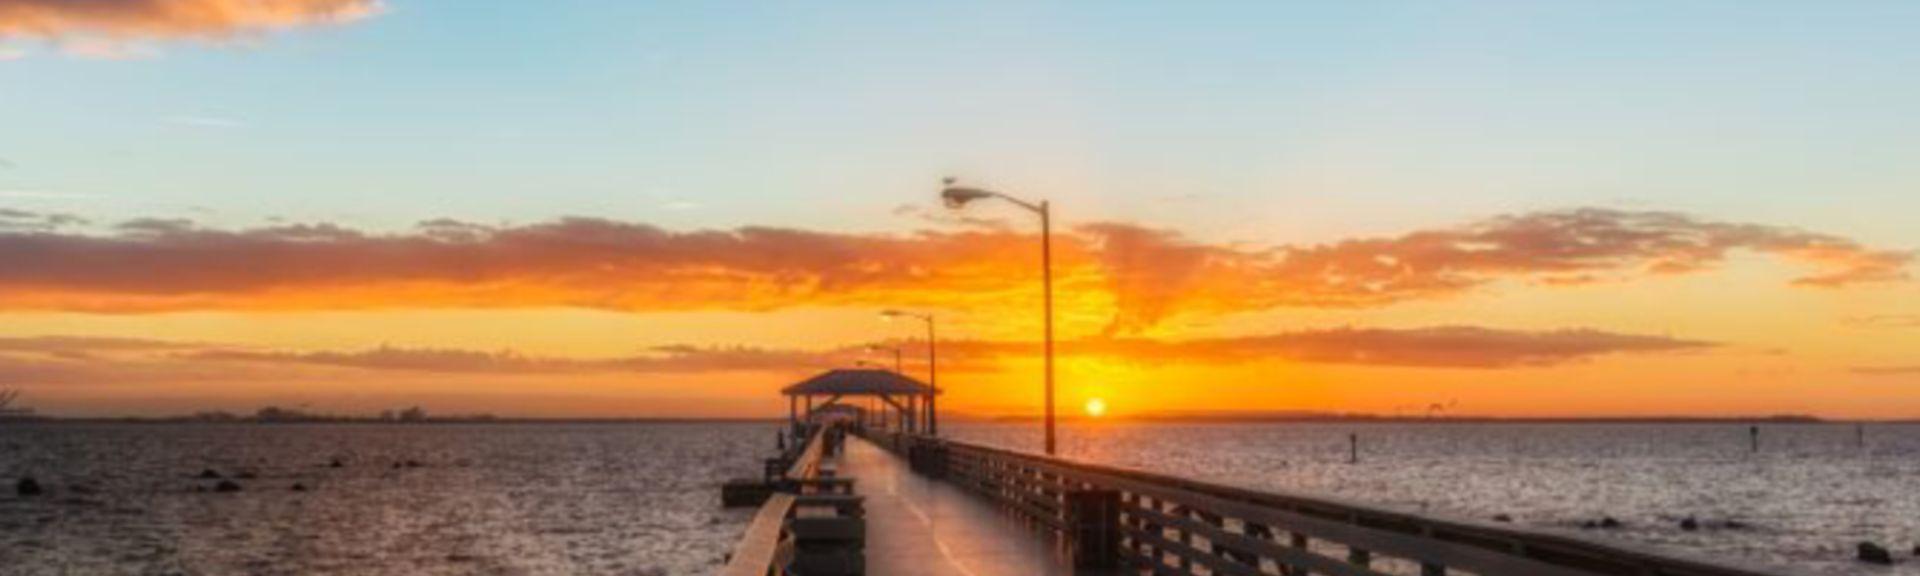 Westfield Brandon, Brandon, FL, USA